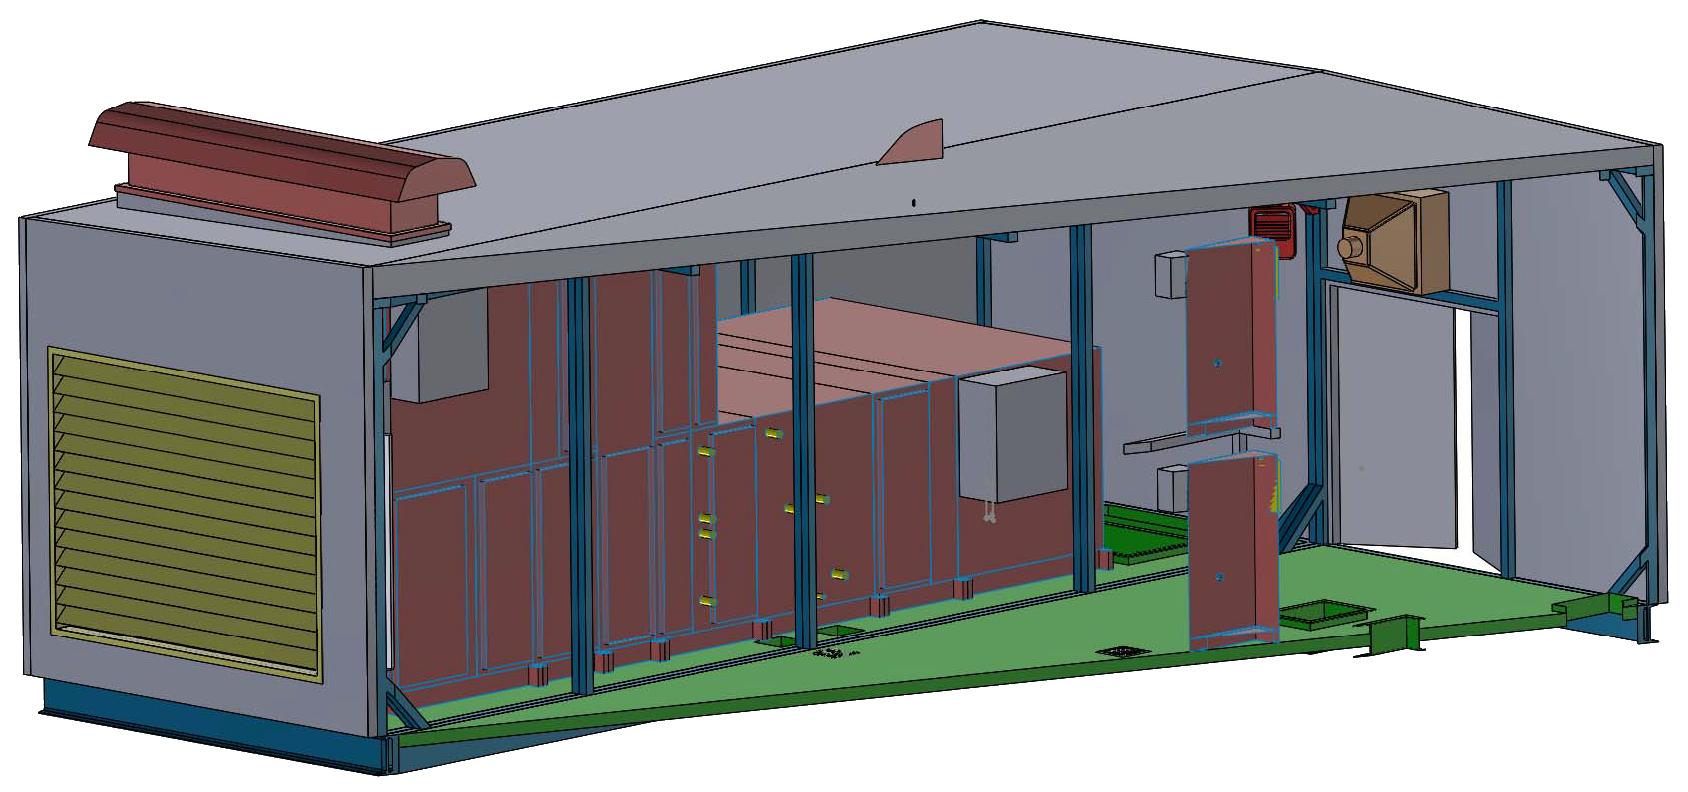 Levin Courthouse • Modular Penthouse